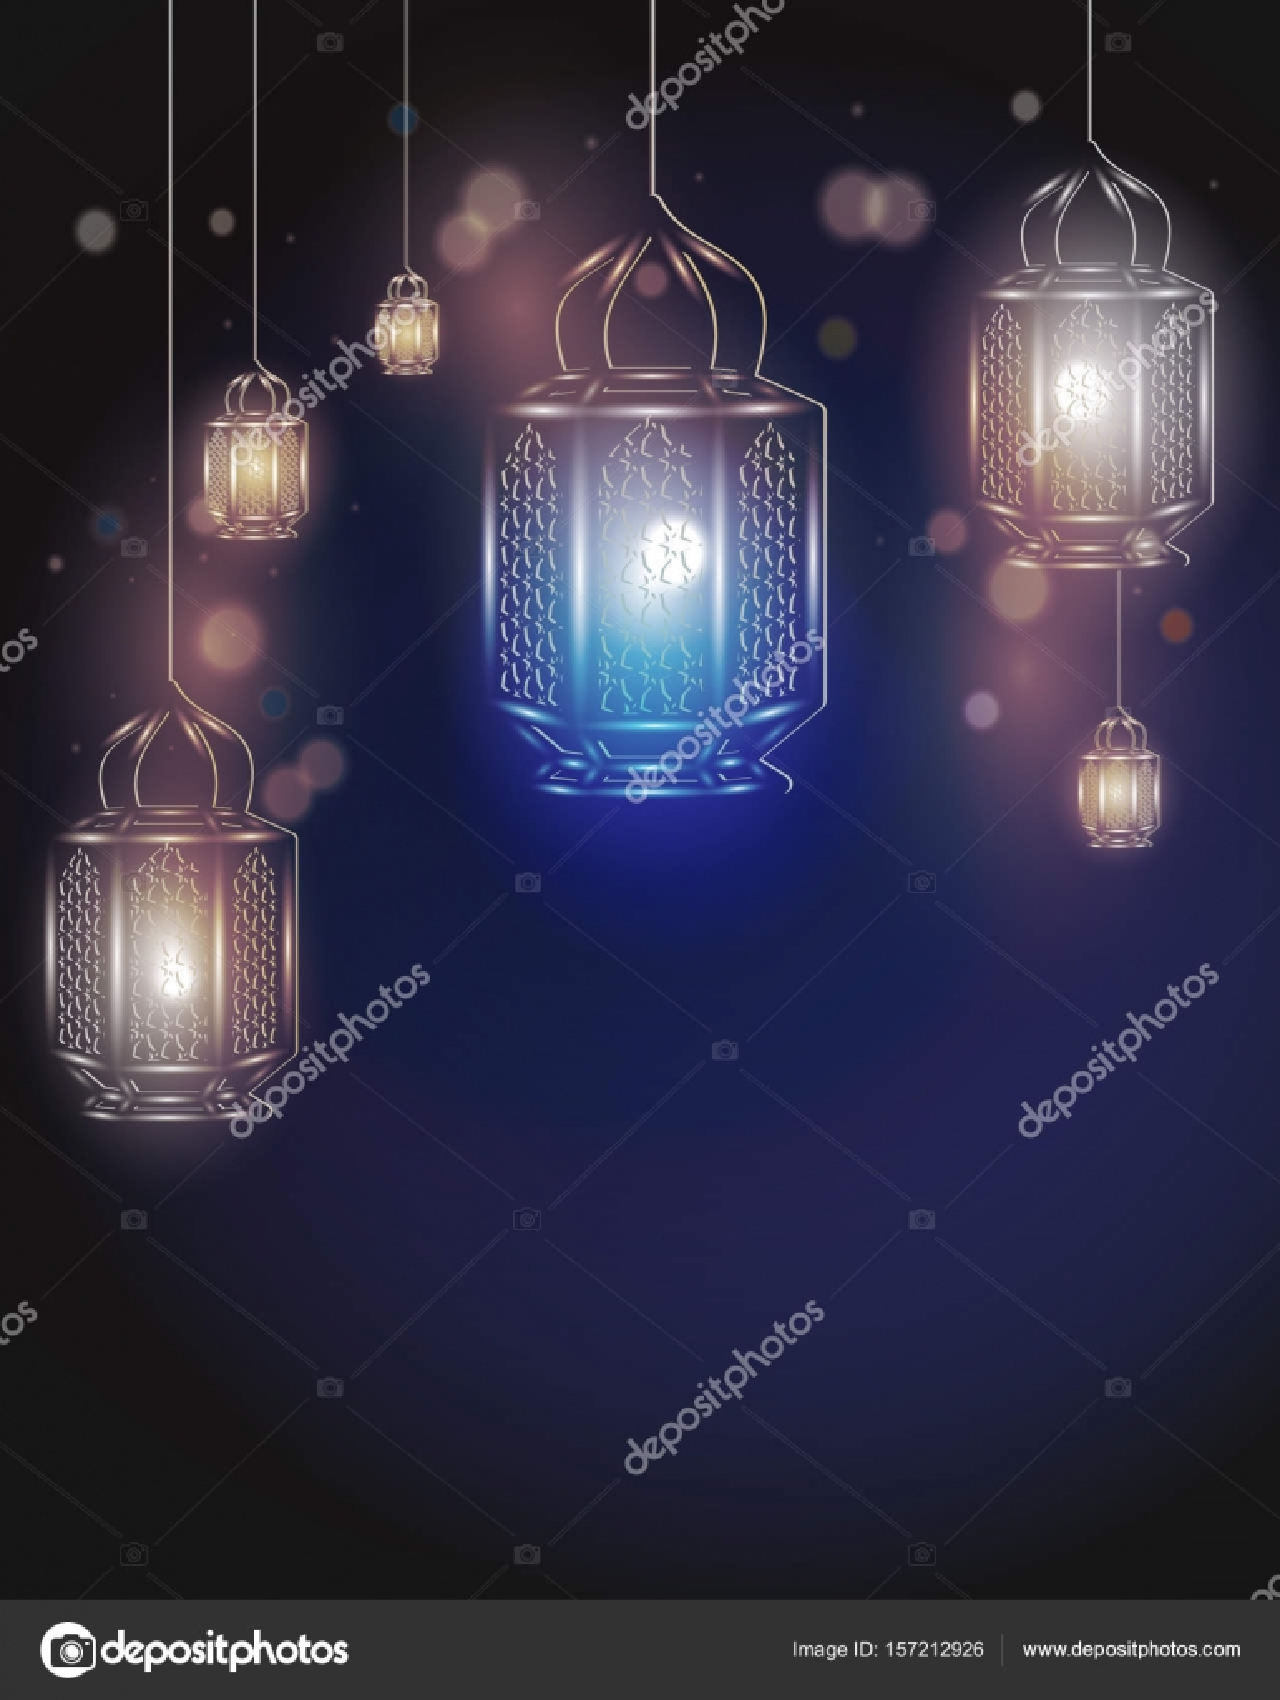 Eid Mubarak Greeting Card Template With Arabic Lamps For Ramadan